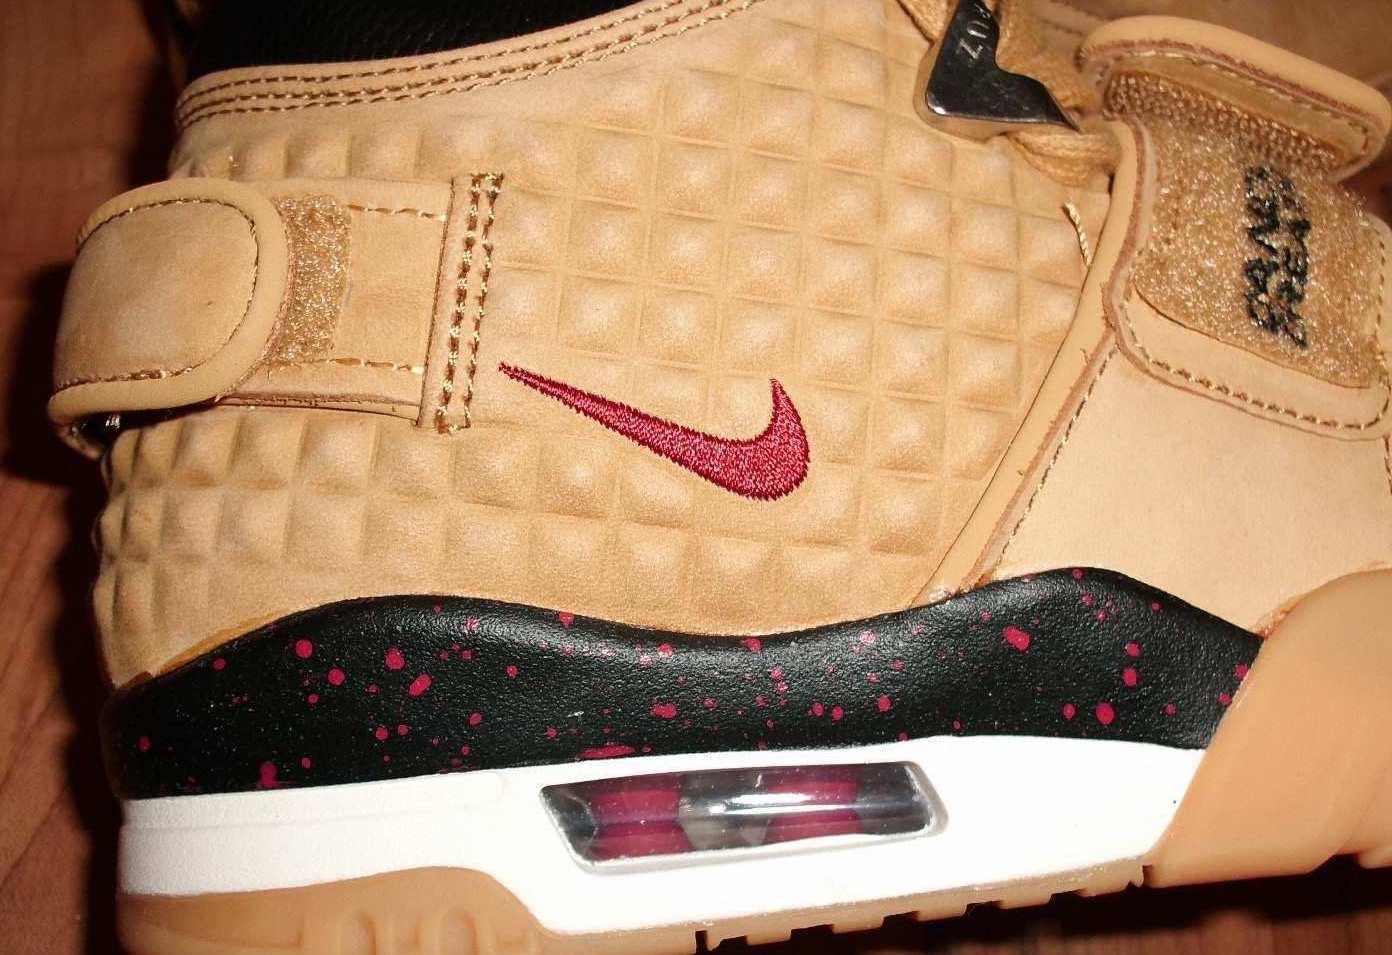 Nike air trainer victor cruz weizen prm heuhaufen weizen cruz / ROT / - sz uns 7,5 us - 8 2ebeef